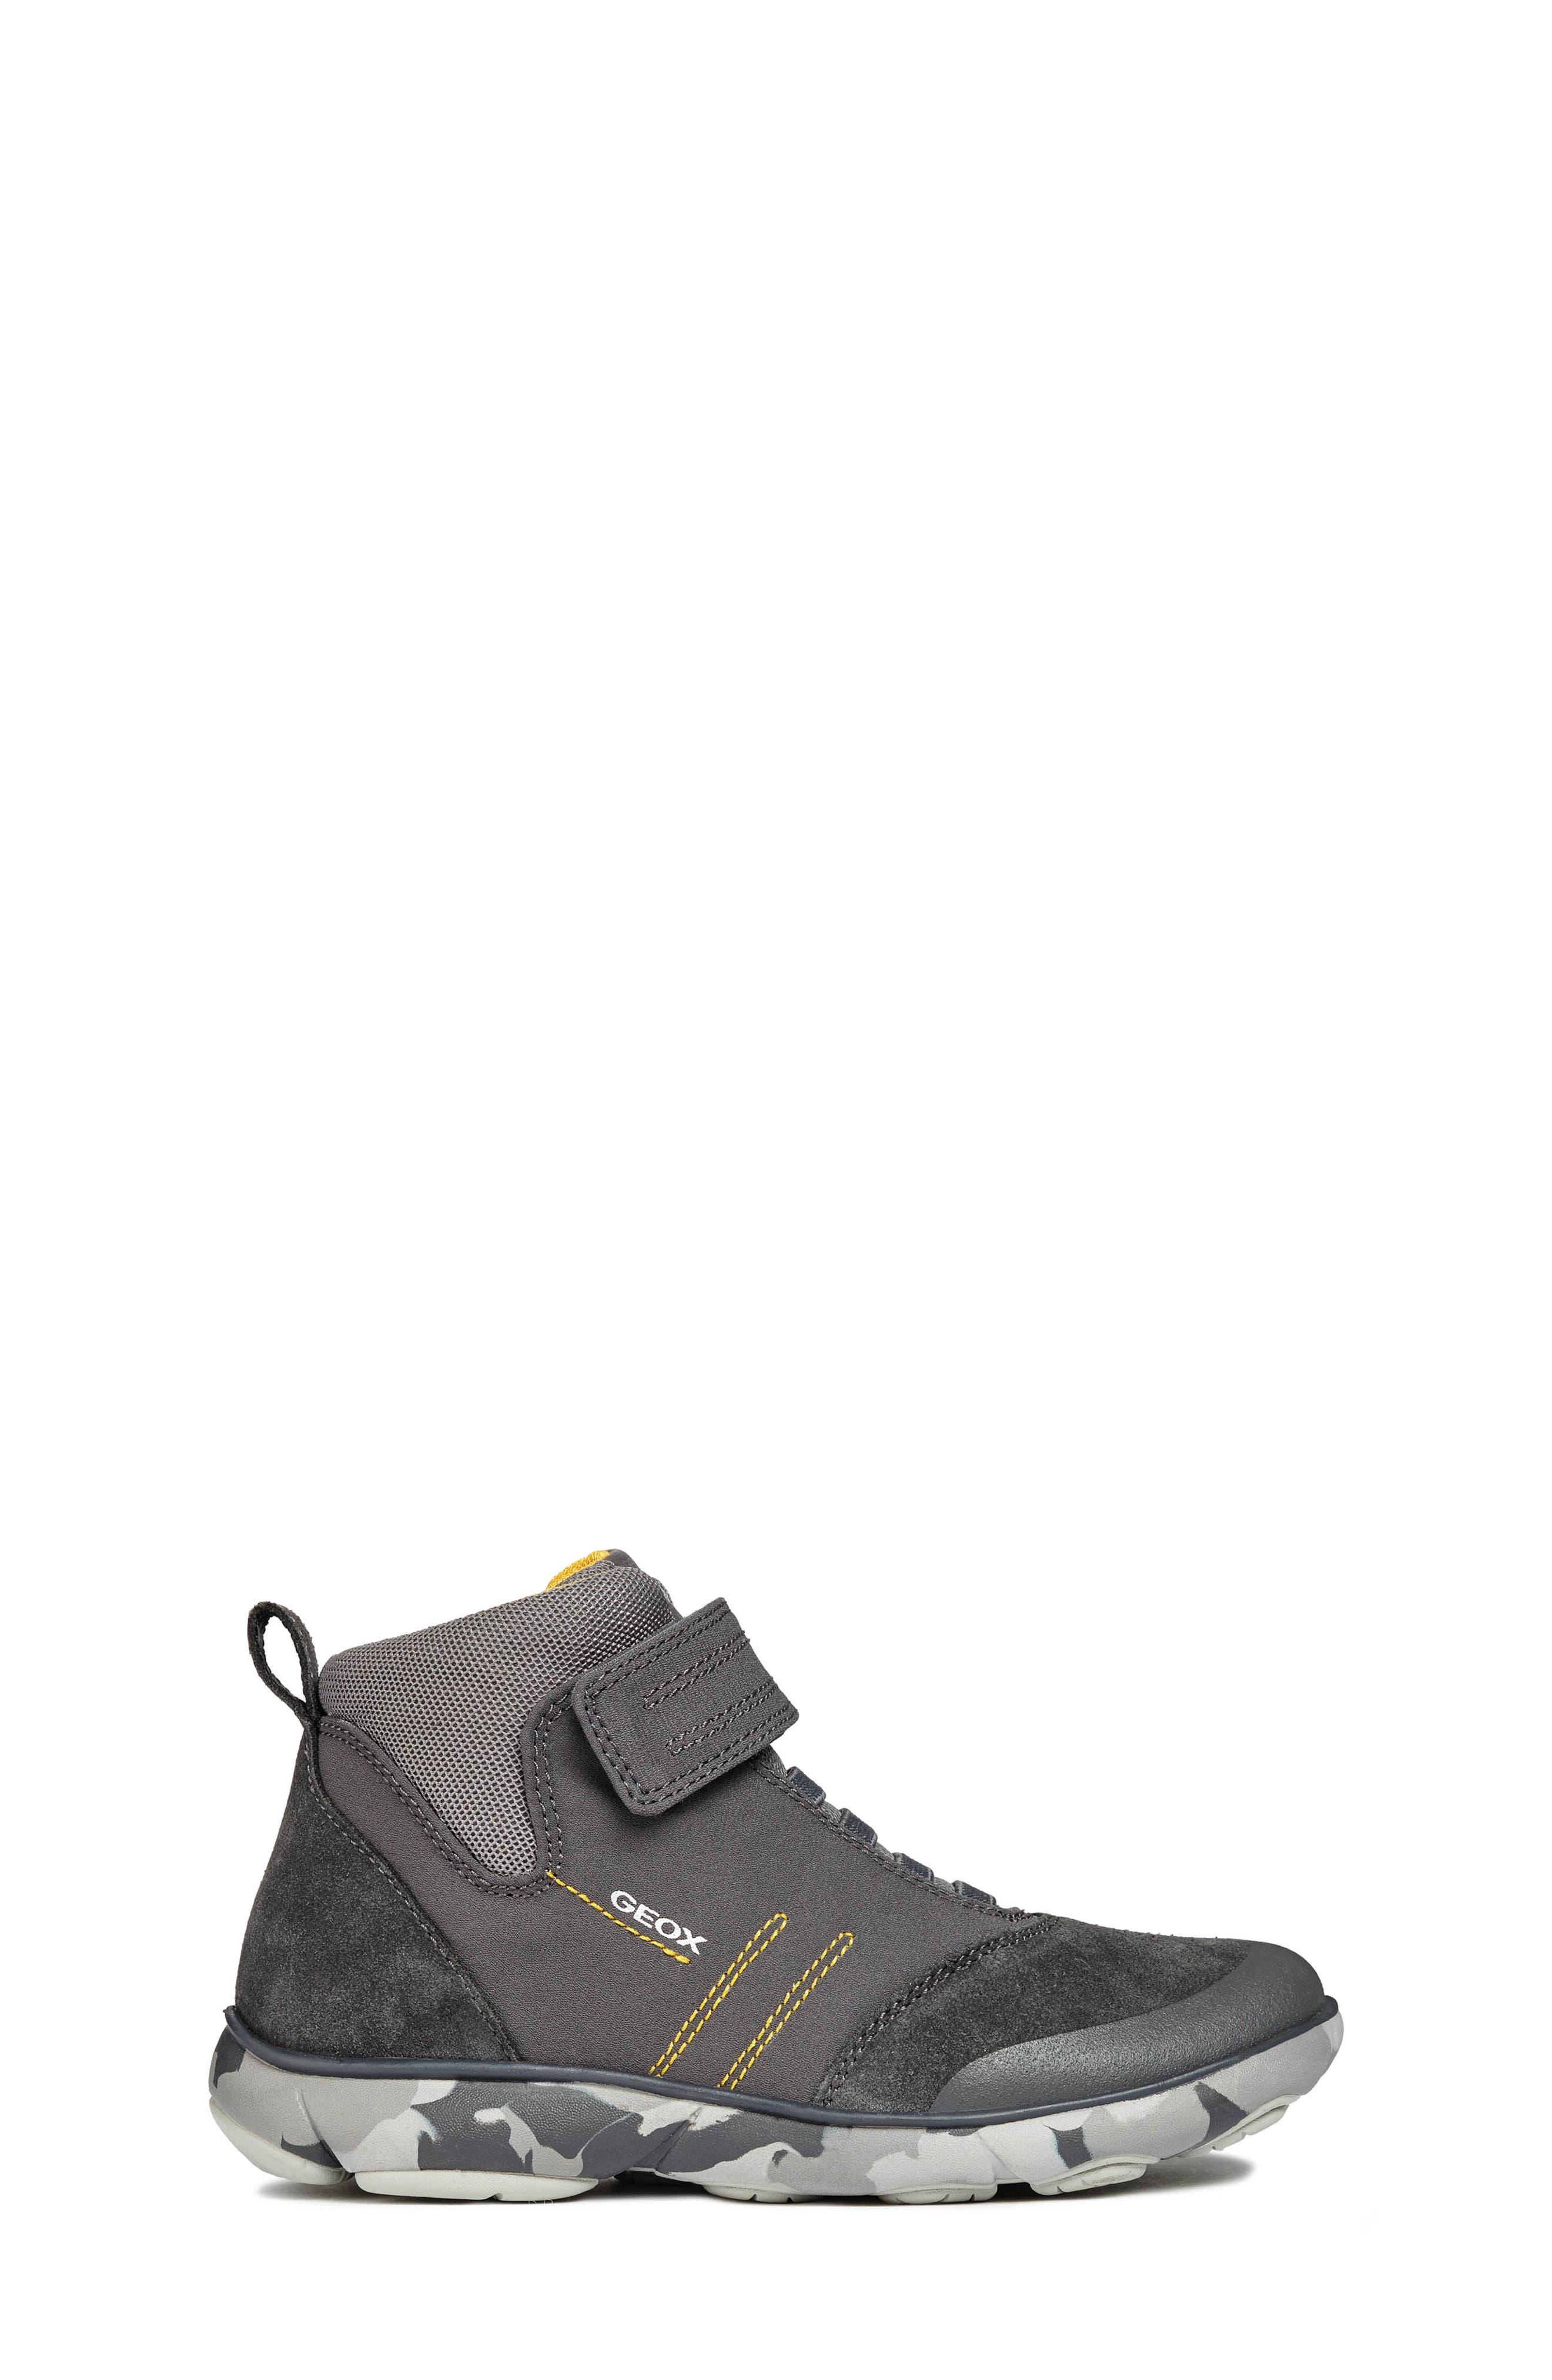 Nebula Boot,                             Alternate thumbnail 3, color,                             GREY/YELLOW